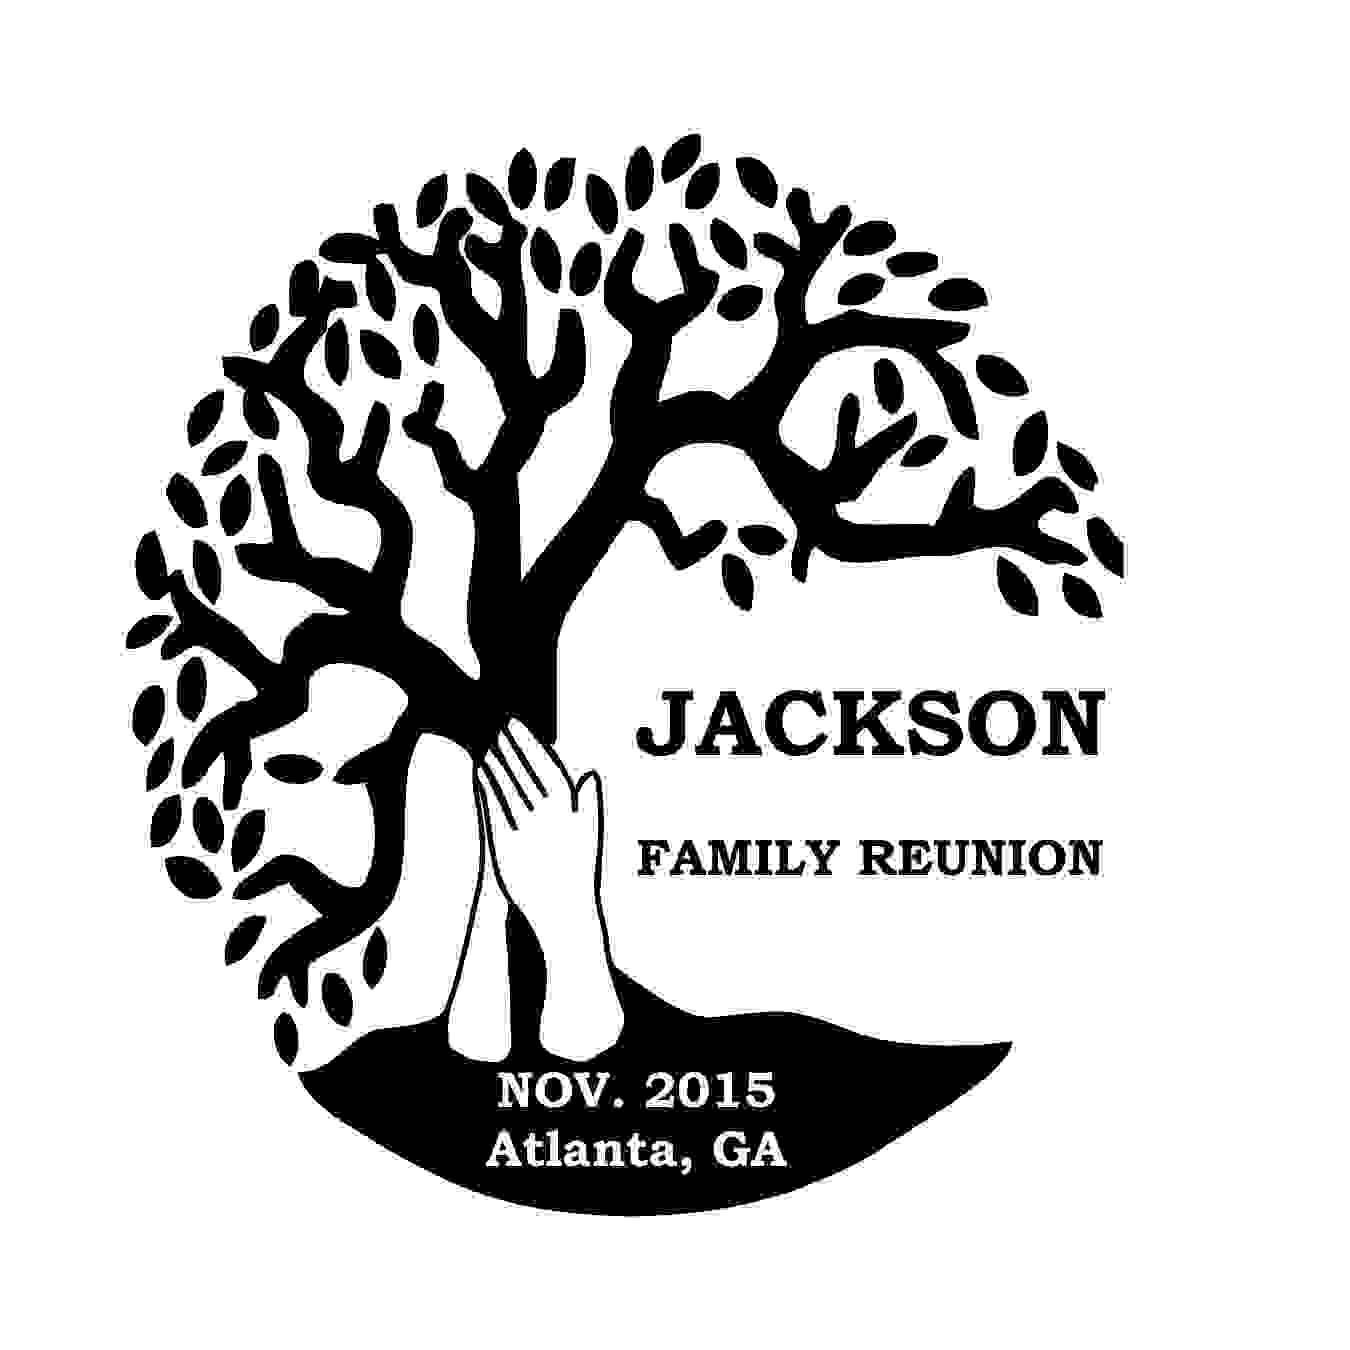 Family Reunion Logos